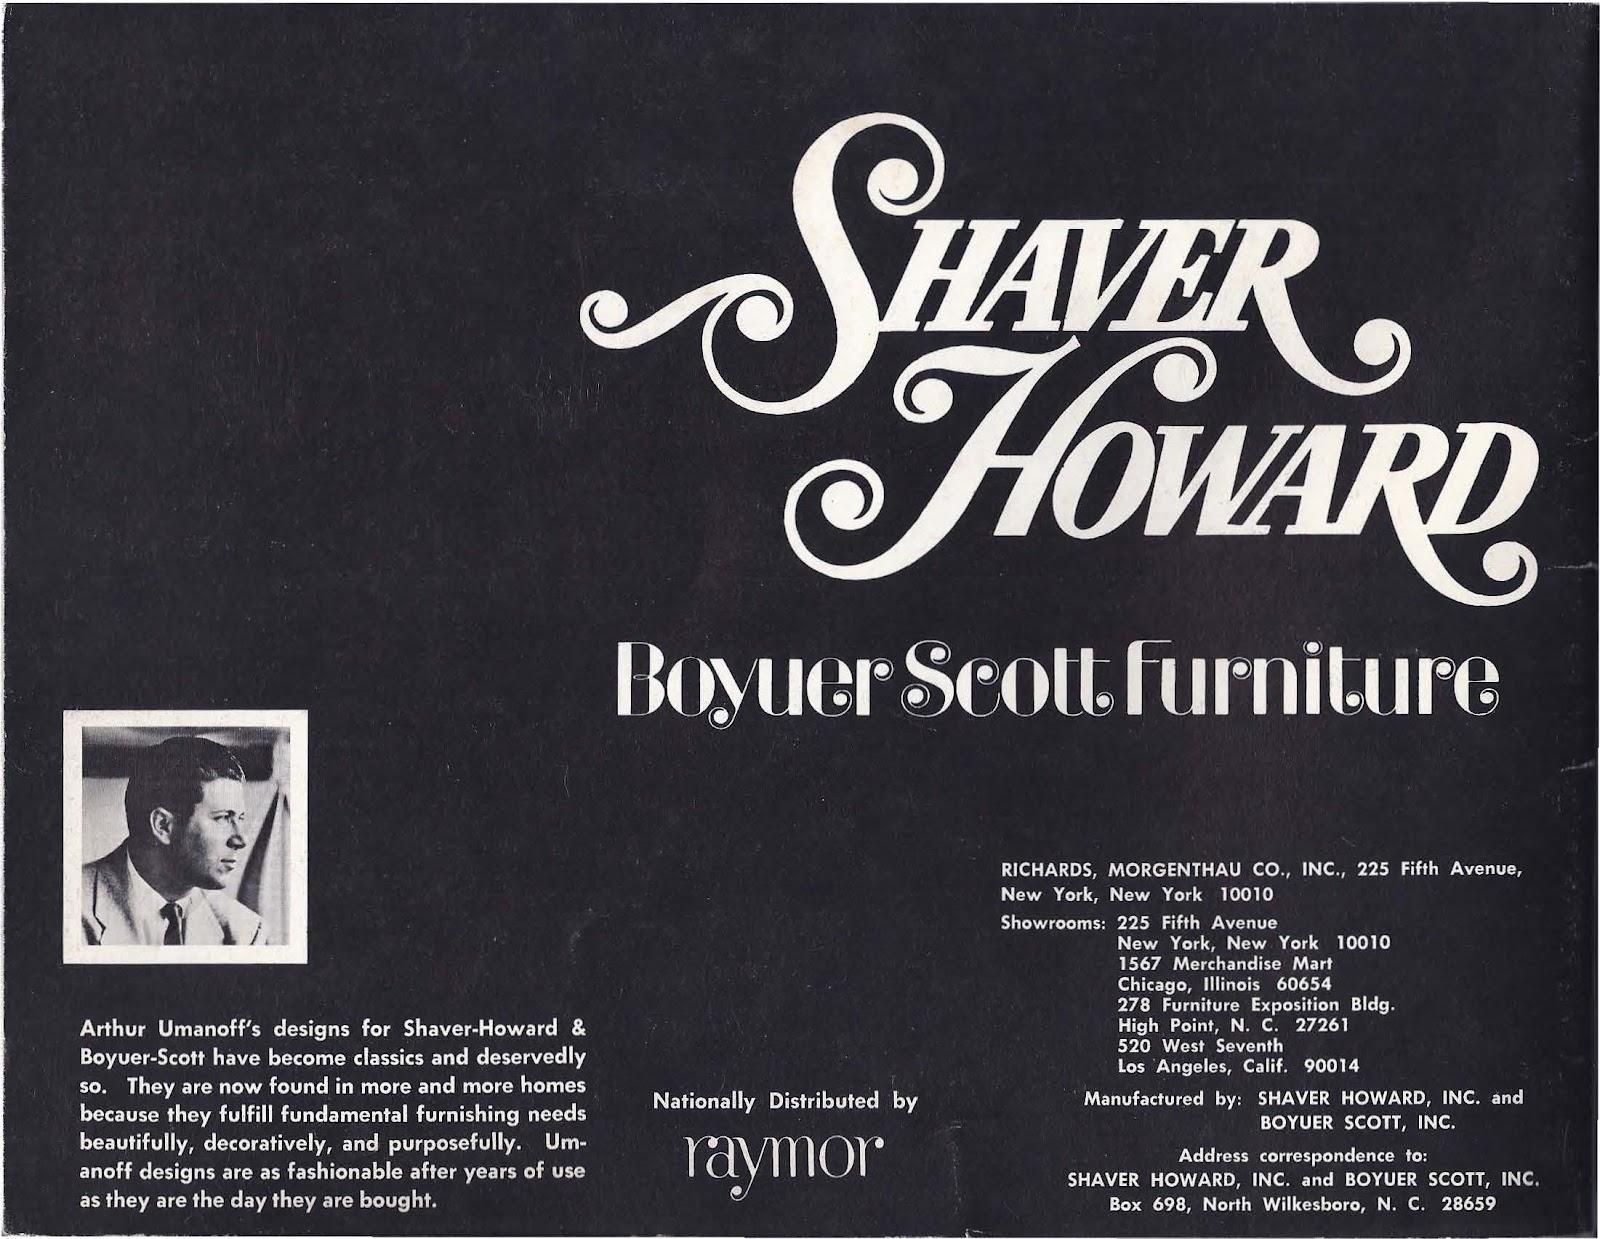 Shaver Howard Furniture Company